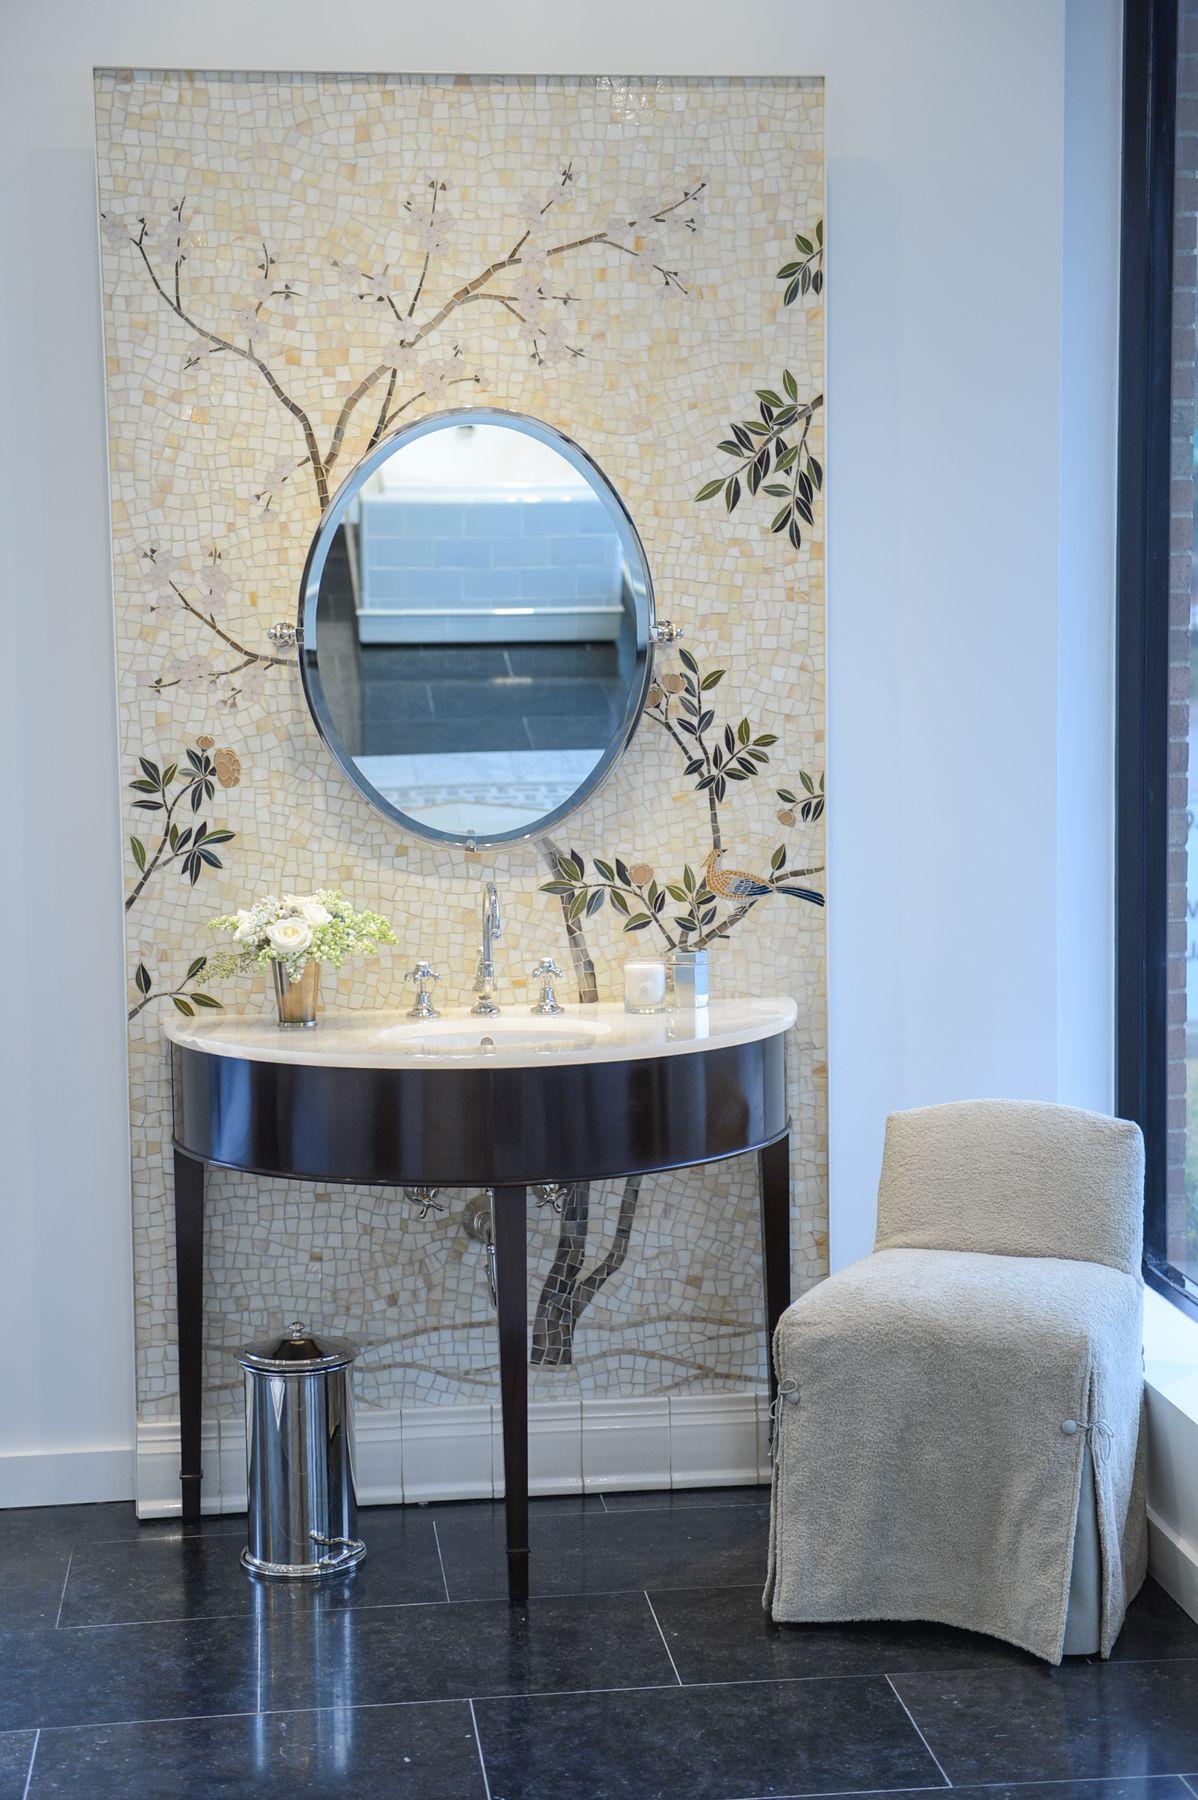 Waterworks Dallas Showroom | Interior Design - Bathrooms | Pinterest ...